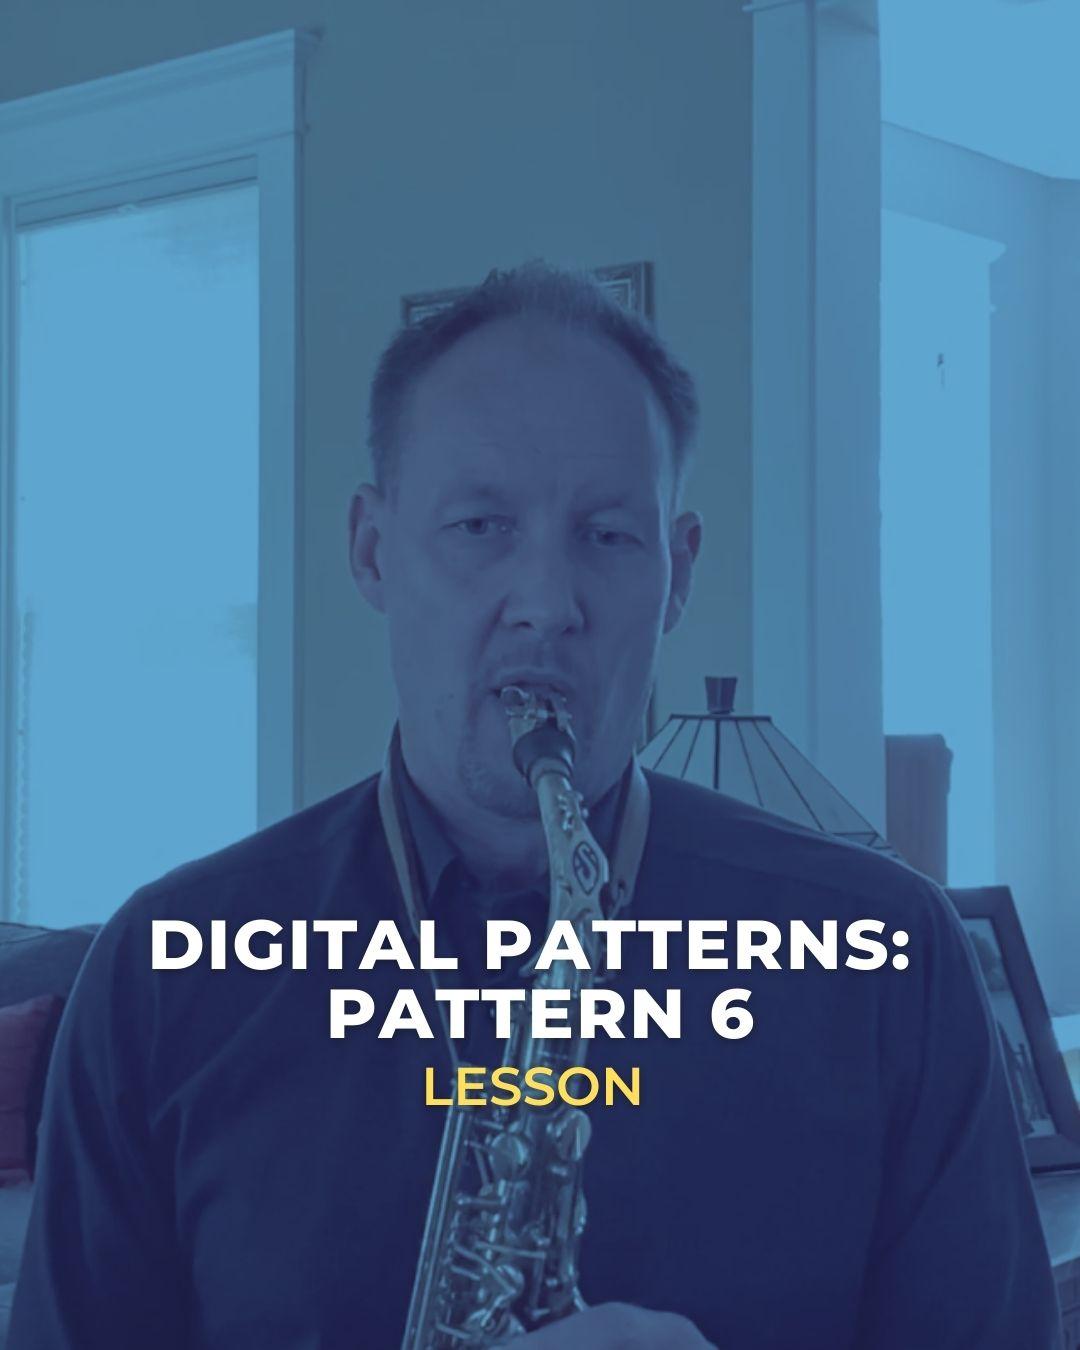 Digital Pattern 6